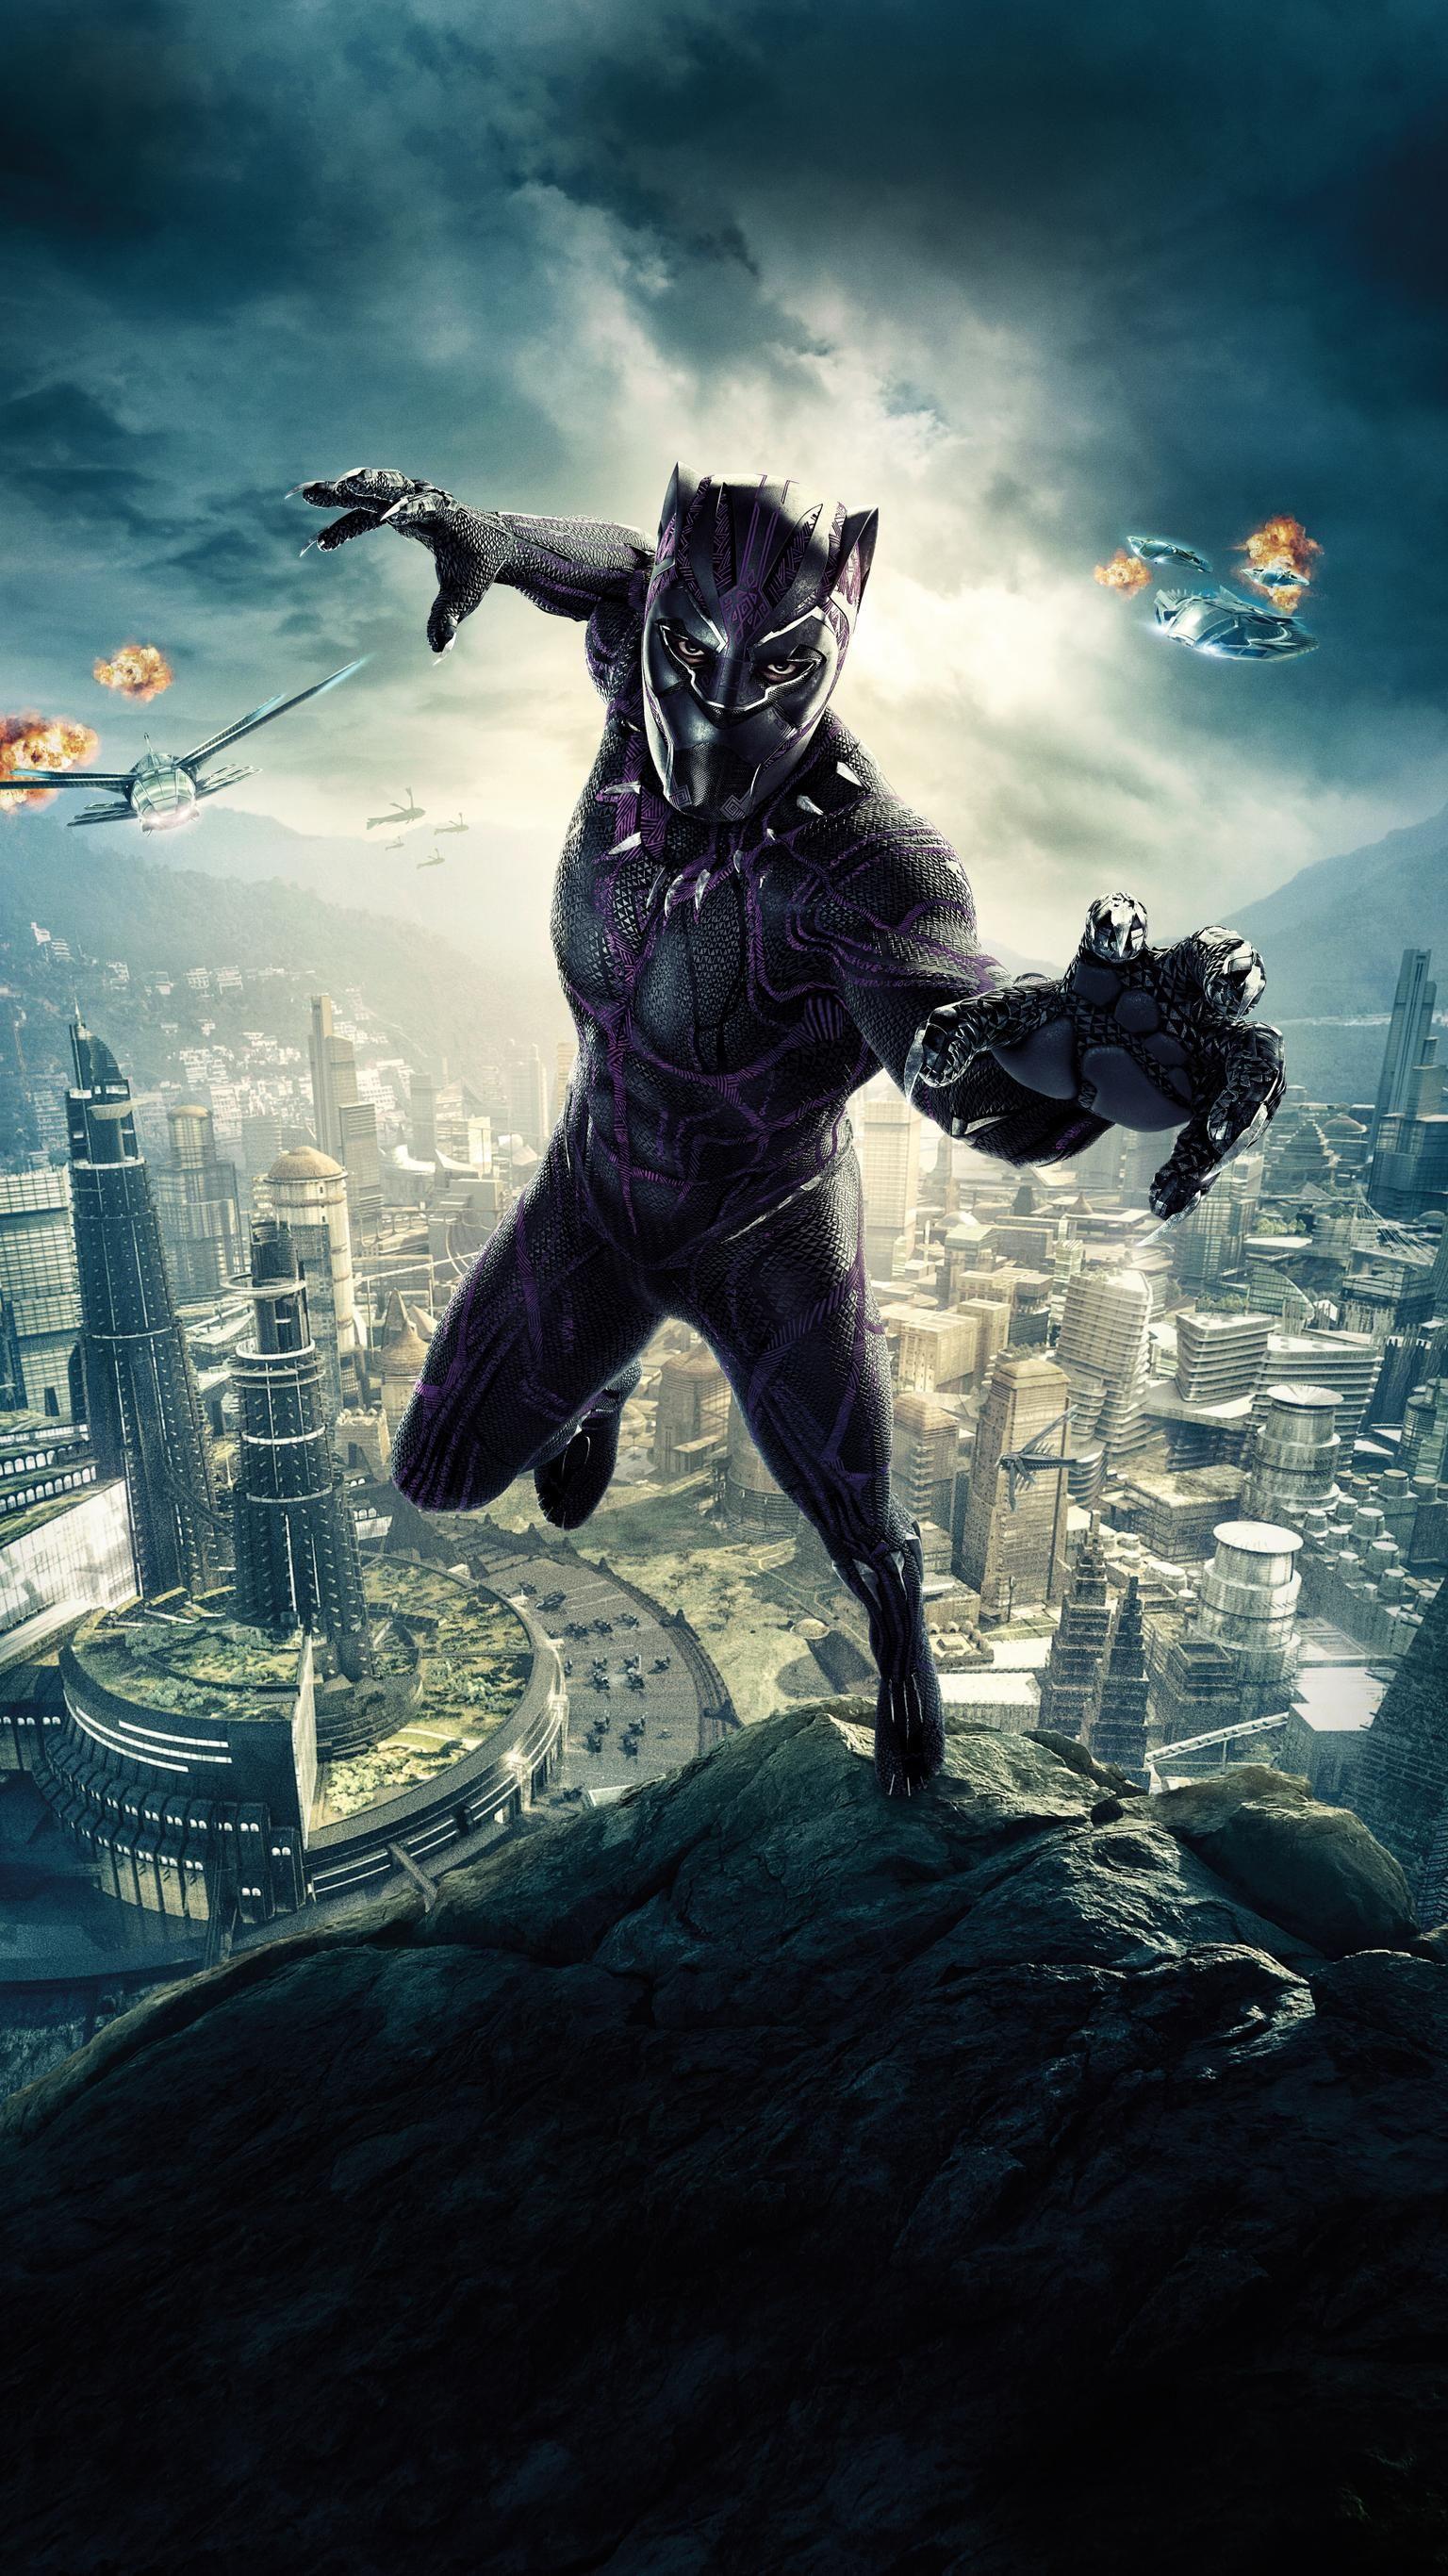 Black Panther 2018 Phone Wallpaper Moviemania Black Panther Marvel Black Panther Art Black Panther Movie Poster